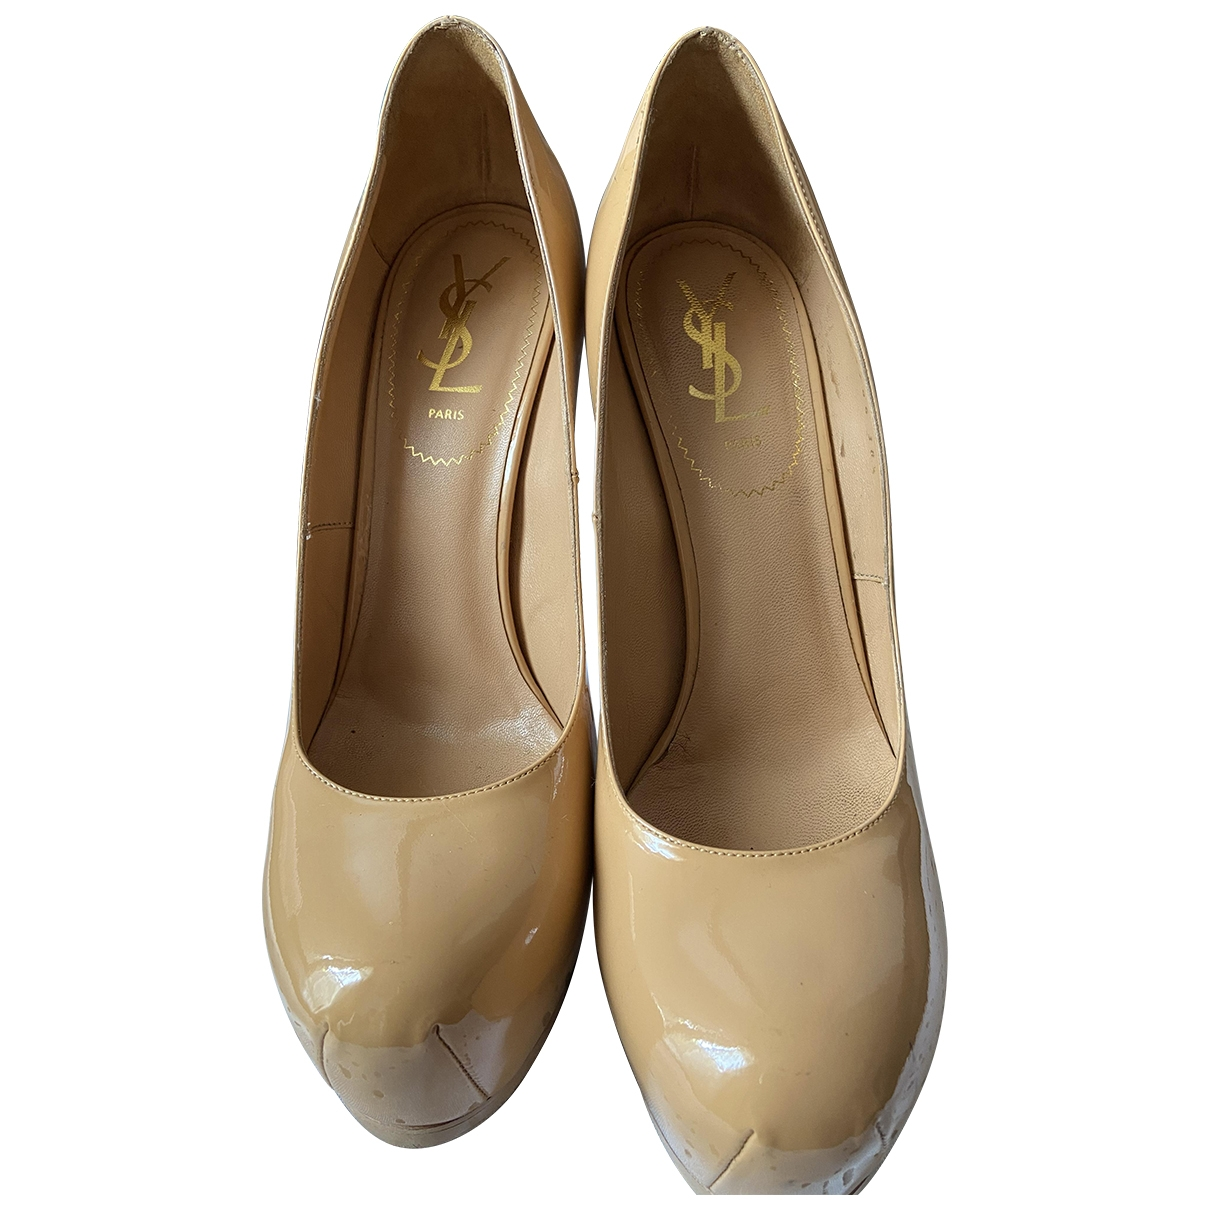 Yves Saint Laurent \N Beige Patent leather Heels for Women 38.5 EU